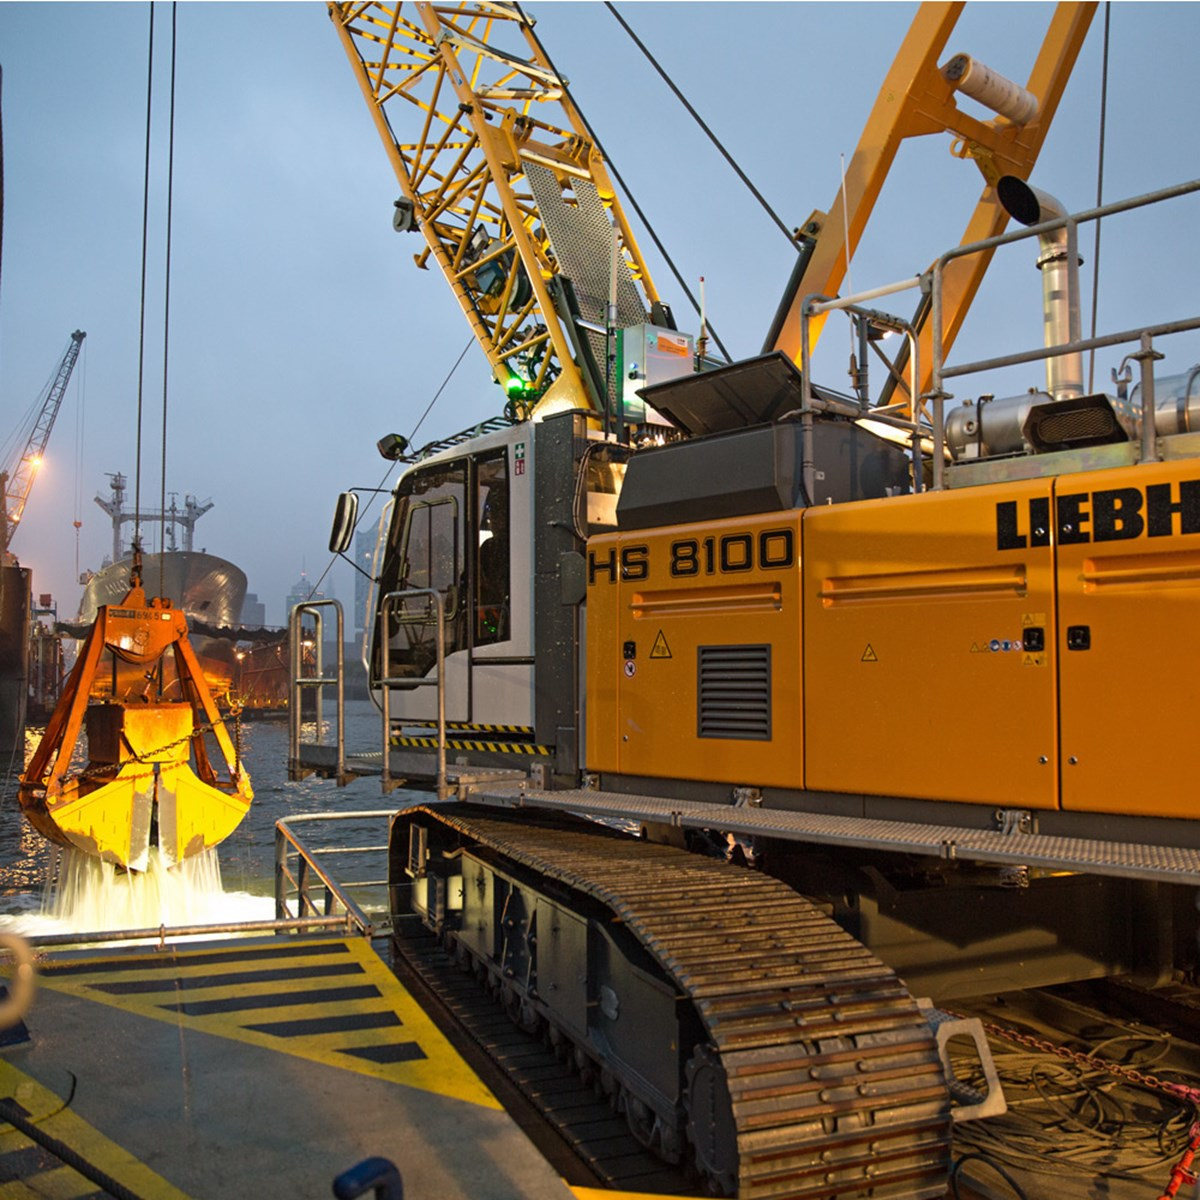 liebherr-hs-8100-seilbagger-crawler-crane-dredging-nassbaggern-8.jpg